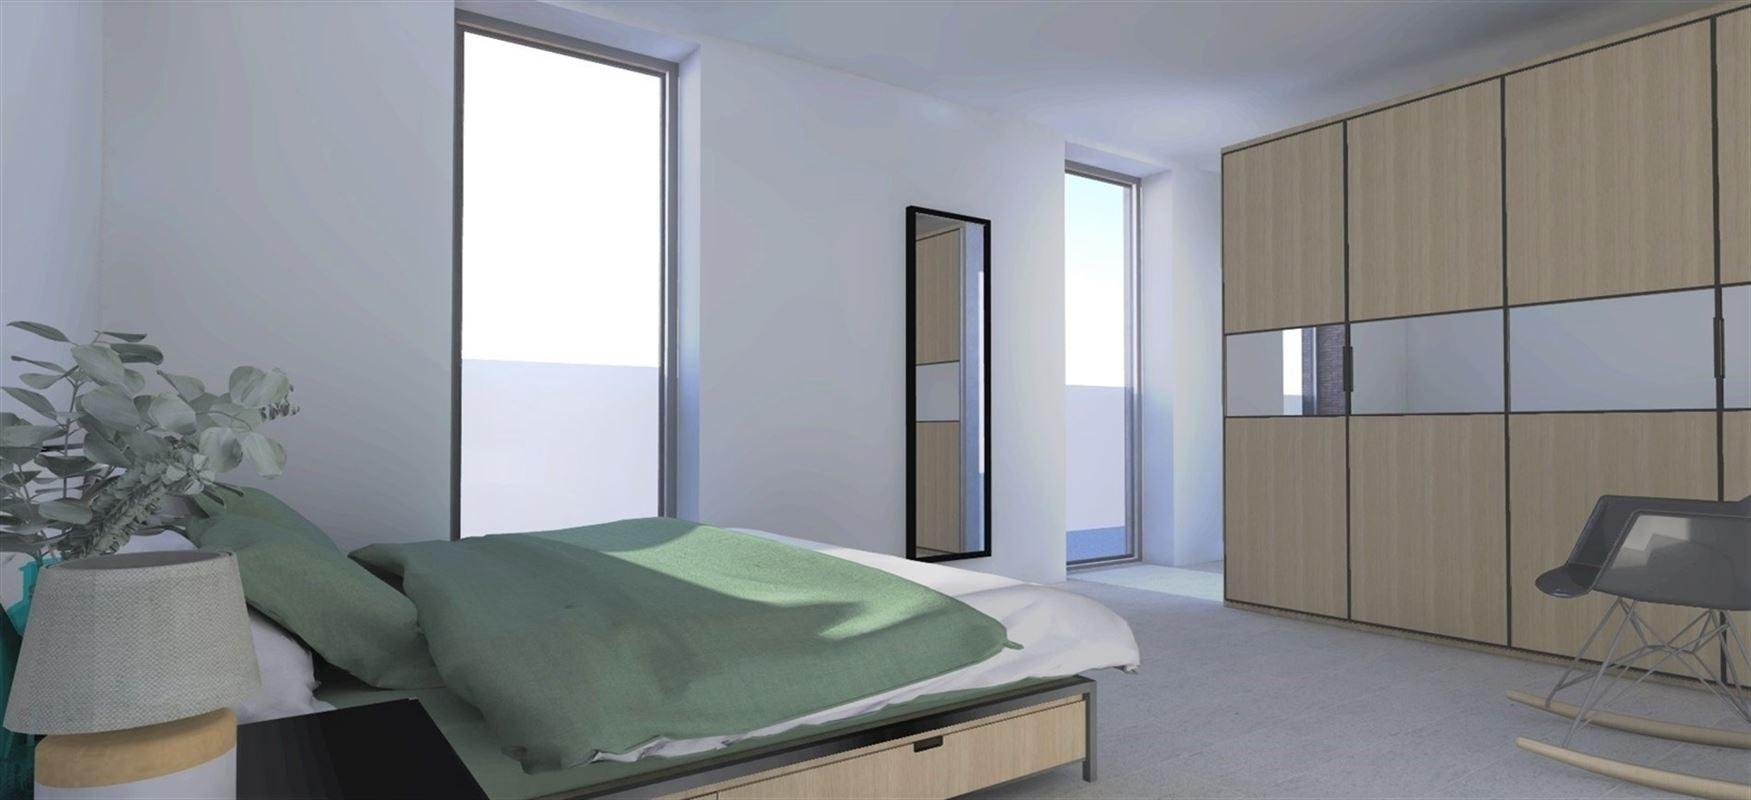 Foto 5 : Appartement te 3960 BREE (België) - Prijs € 226.800